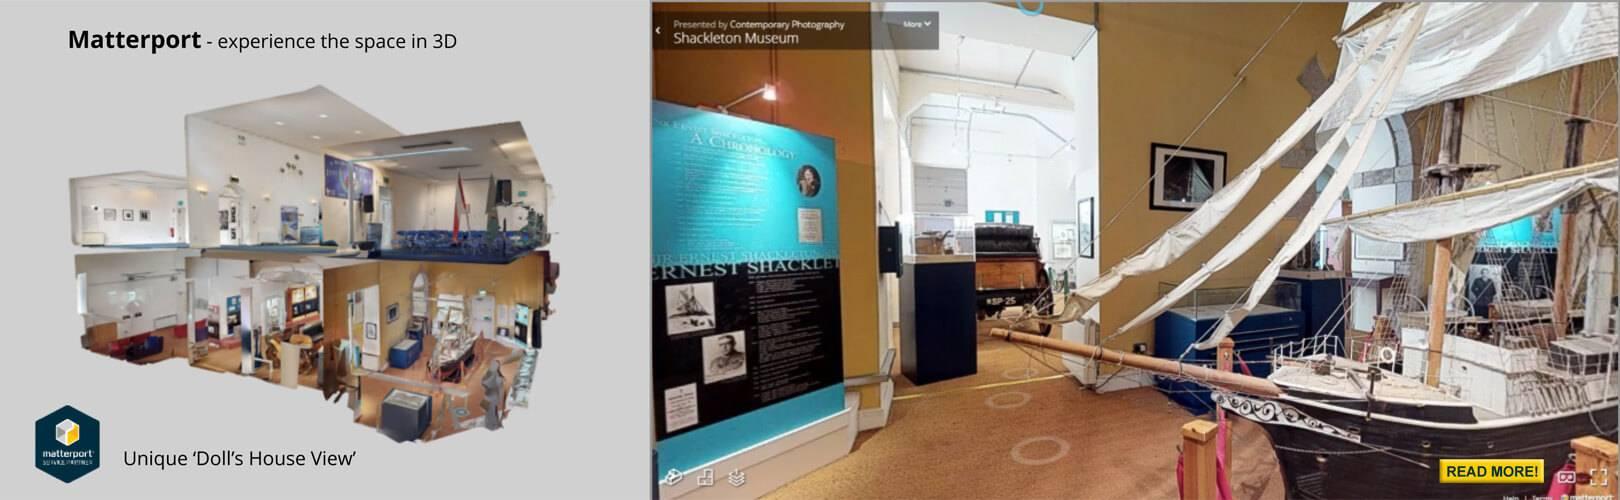 matterport-3d-360-virtual-tours